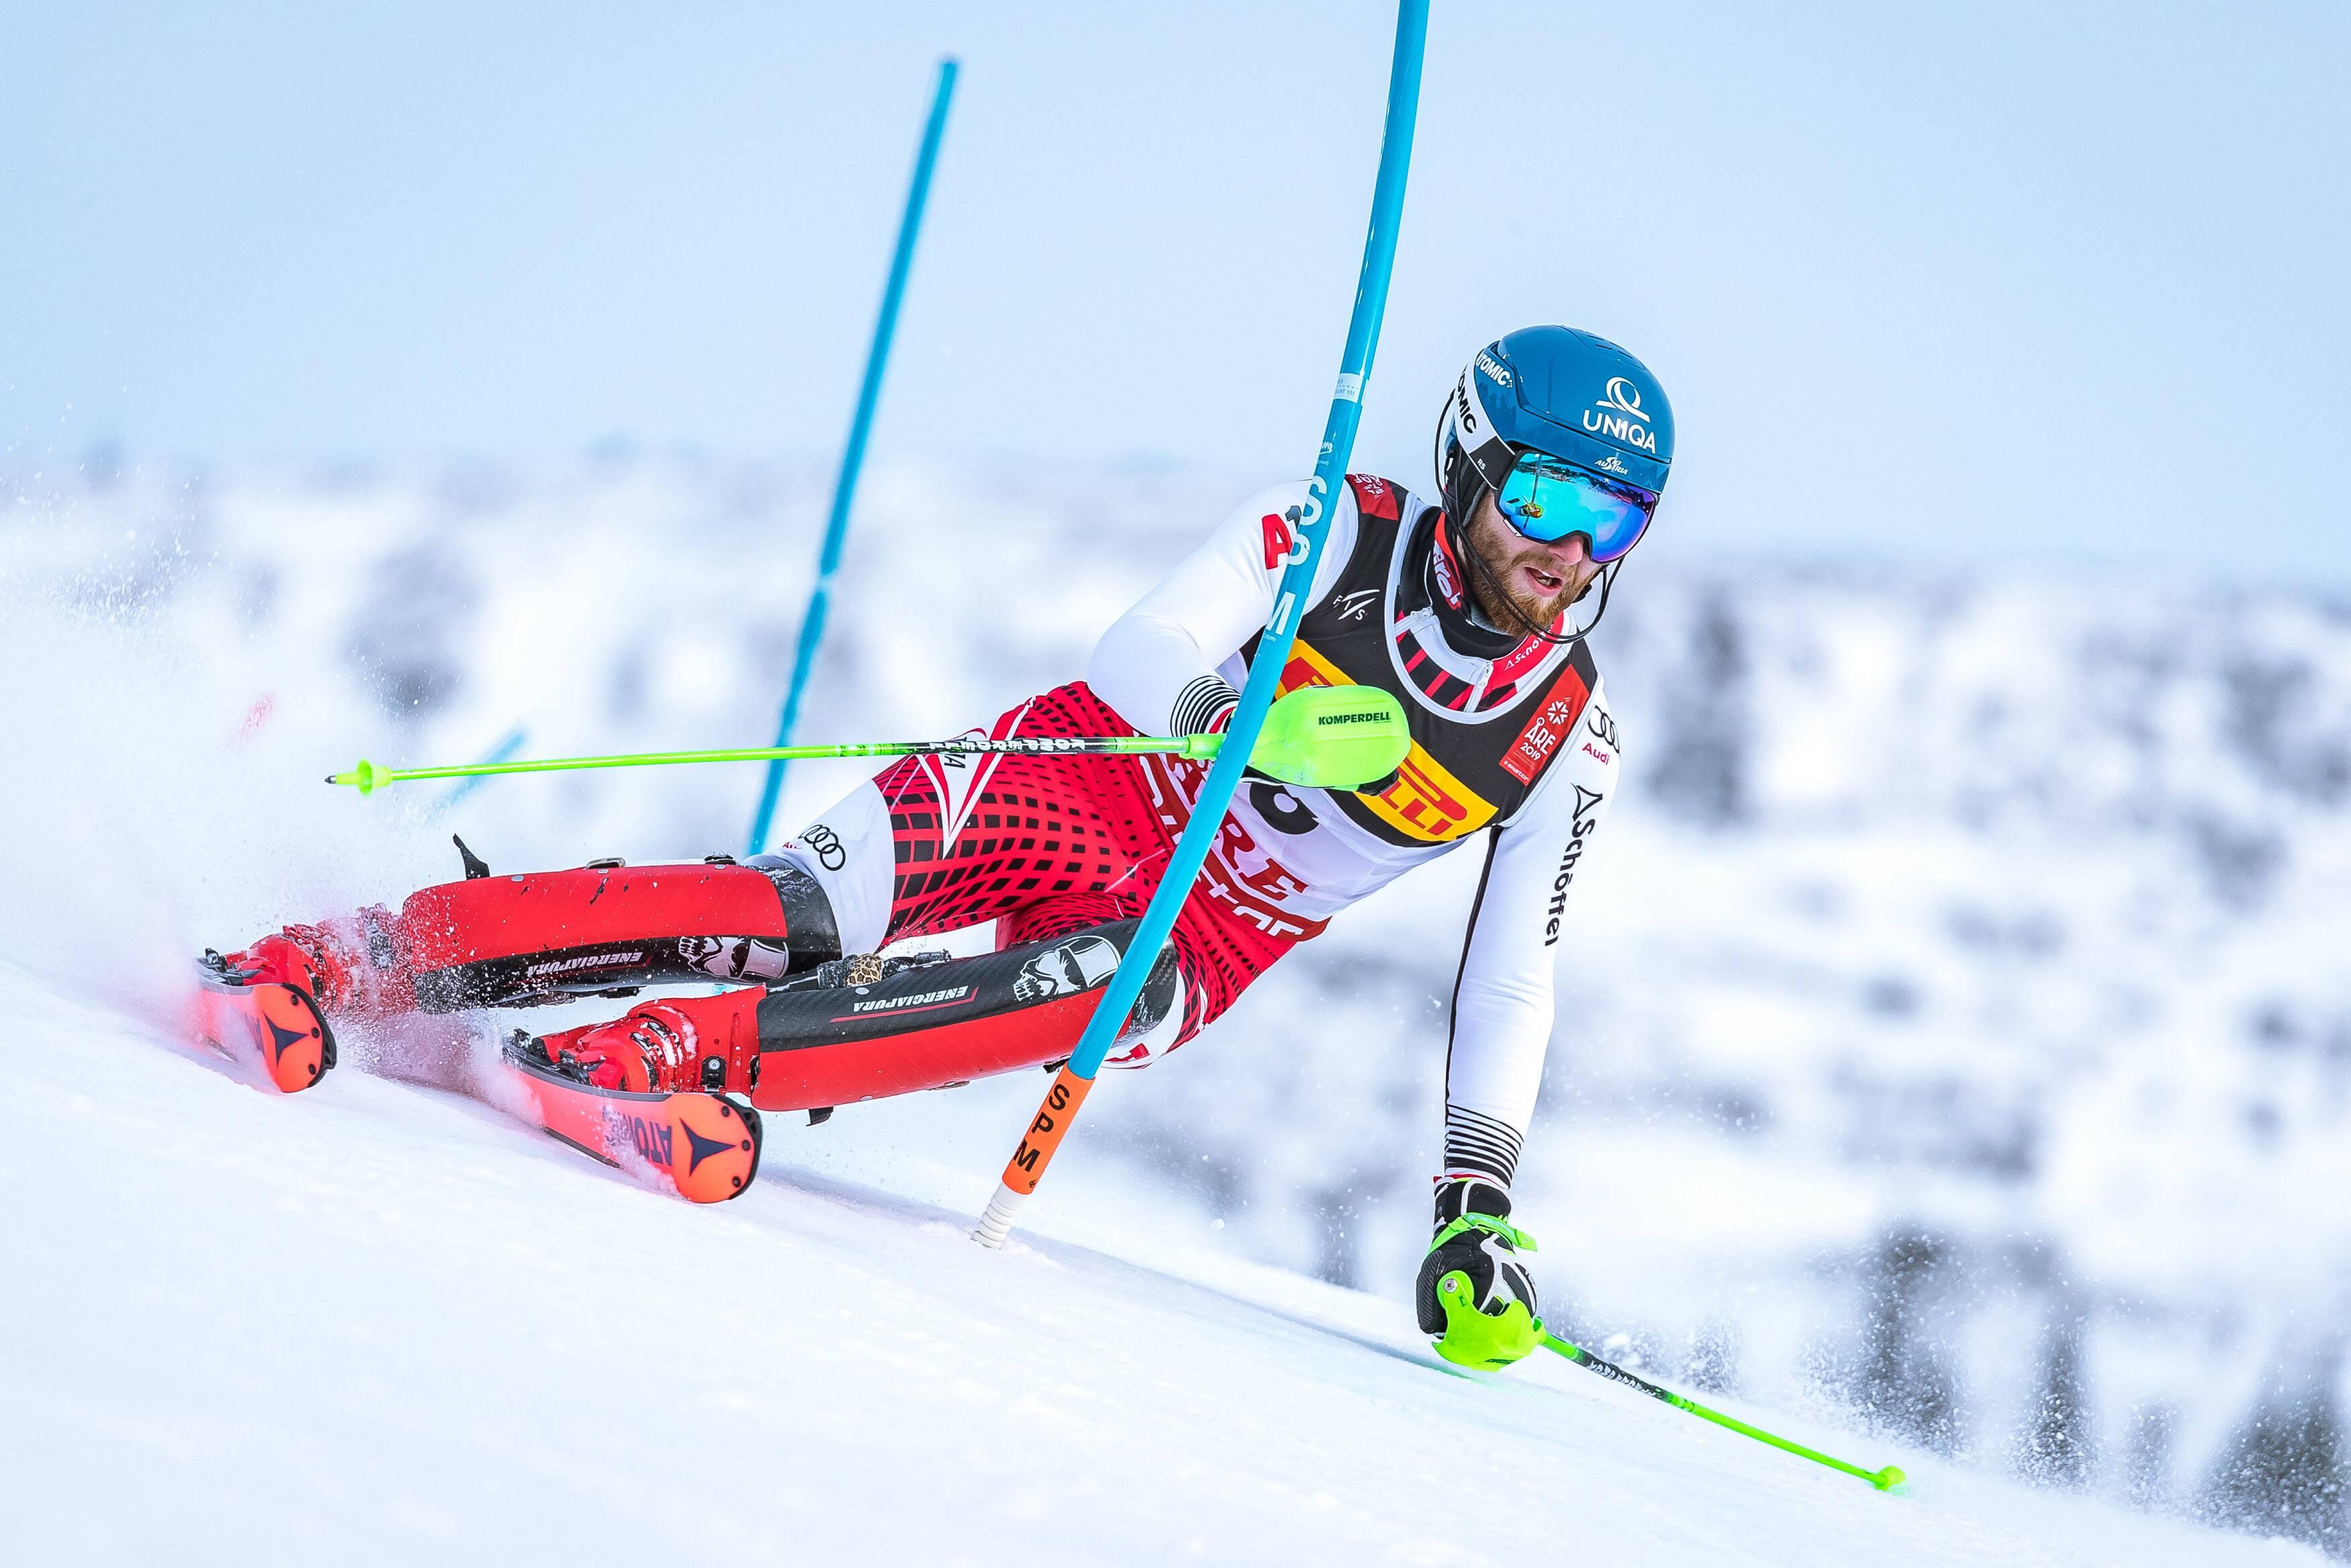 biathlon weltcup 2020/21 termine